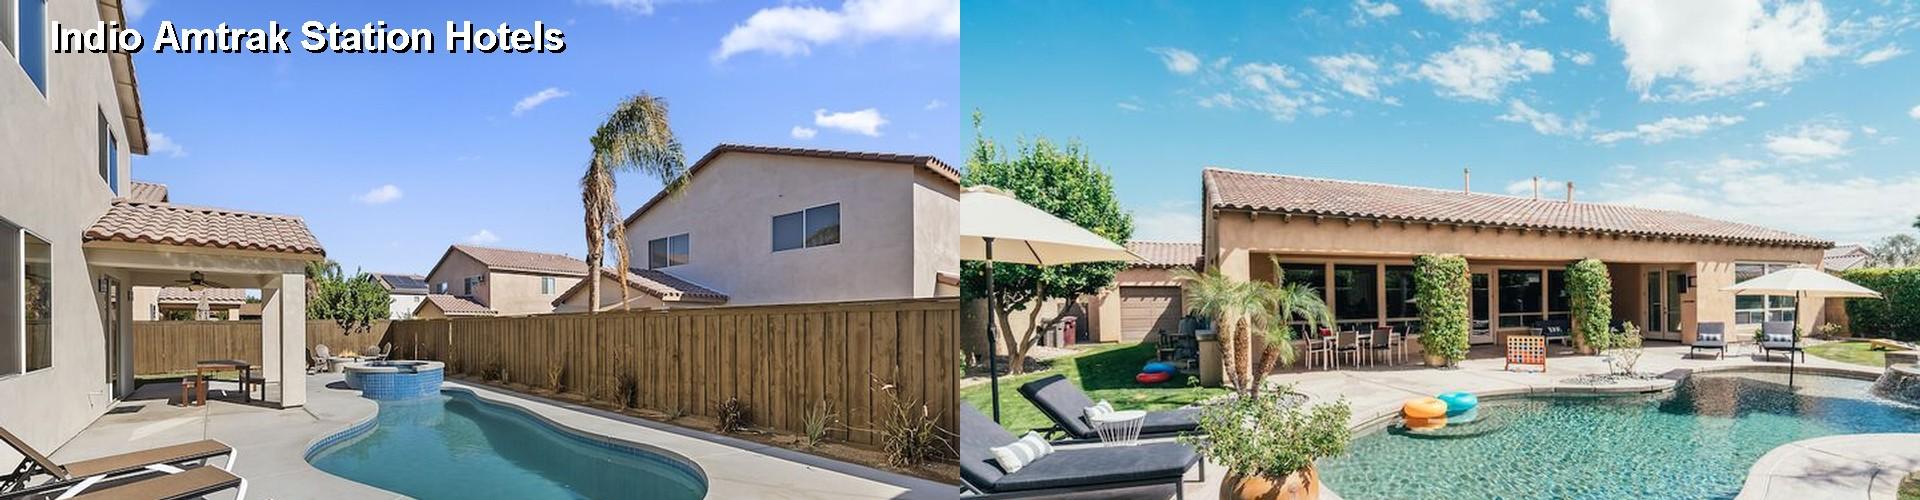 5 Best Hotels Near Indio Amtrak Station